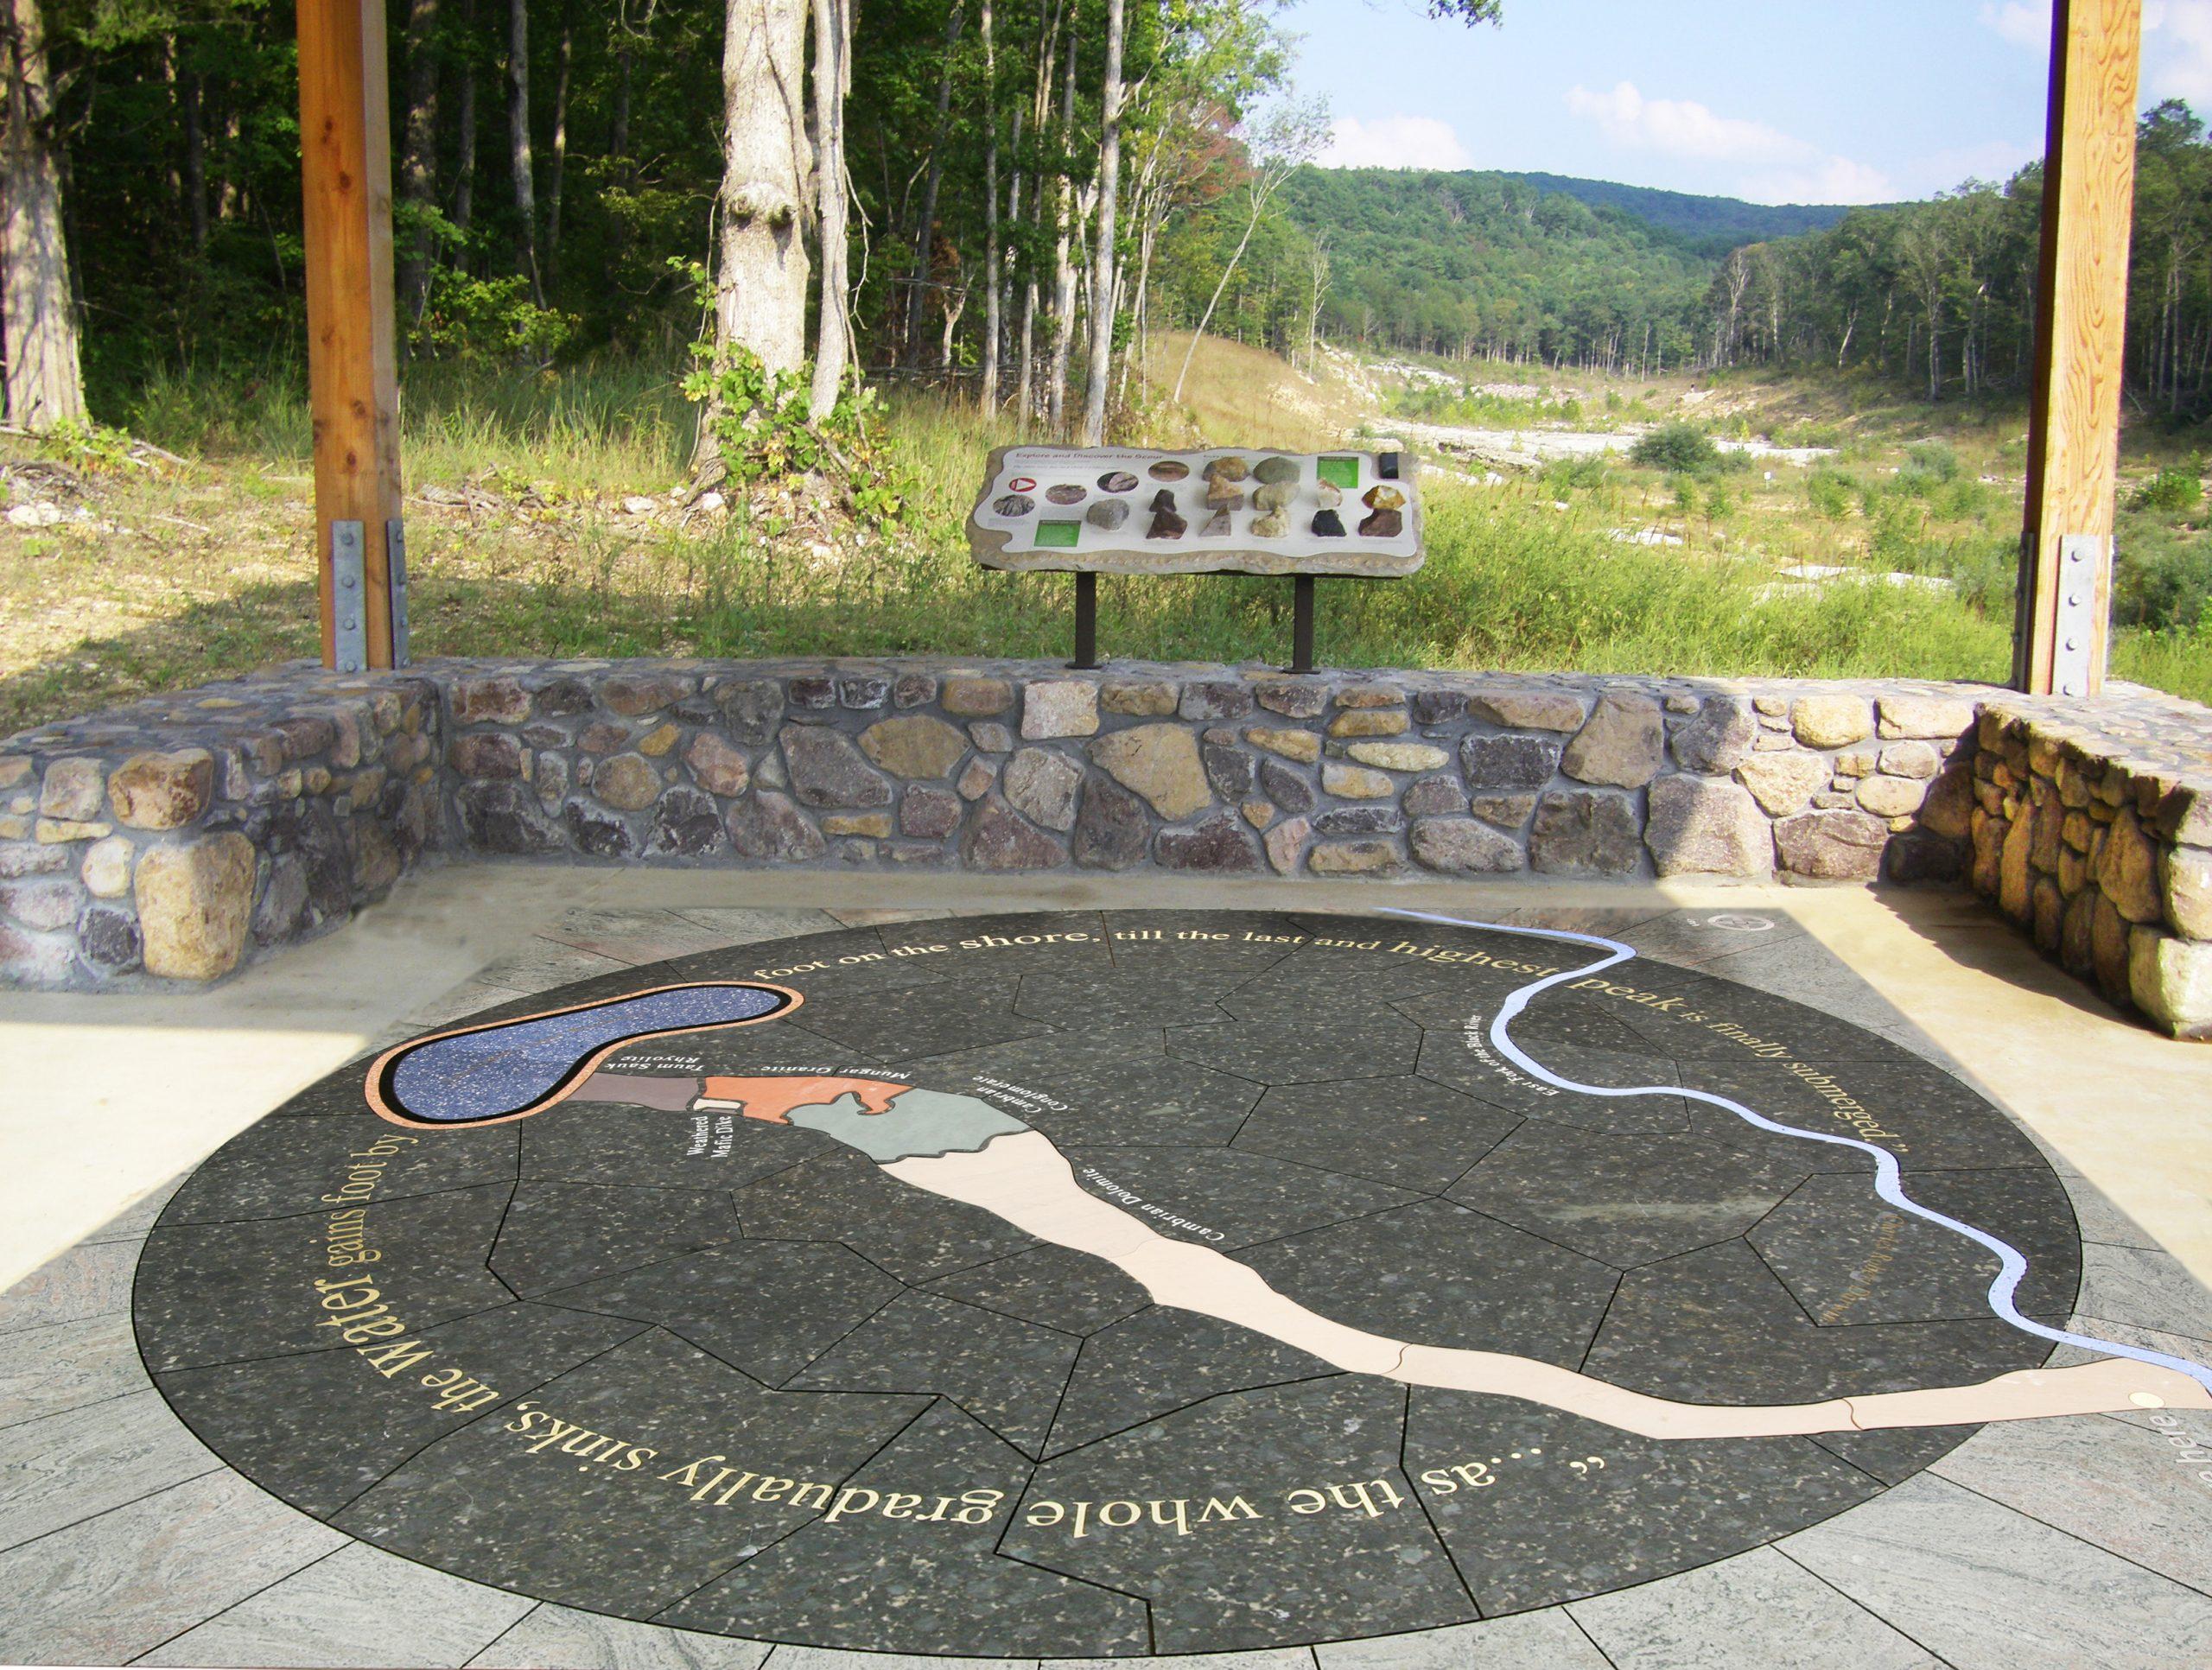 Johnson Shut-Ins State Park